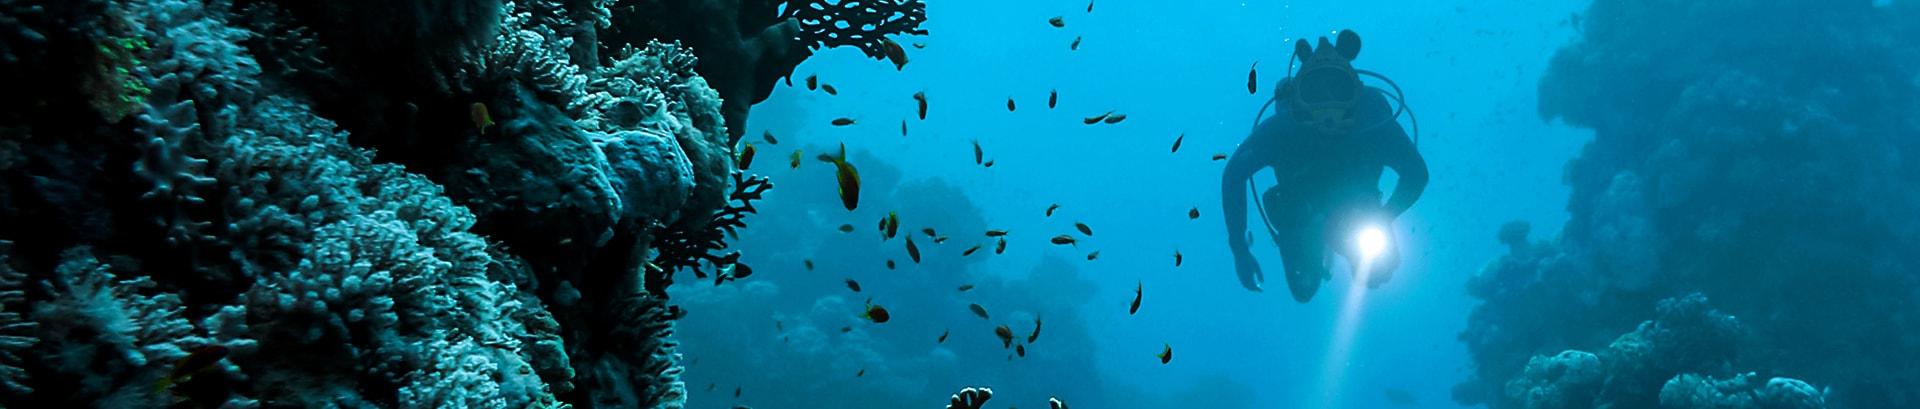 diving umbilicals